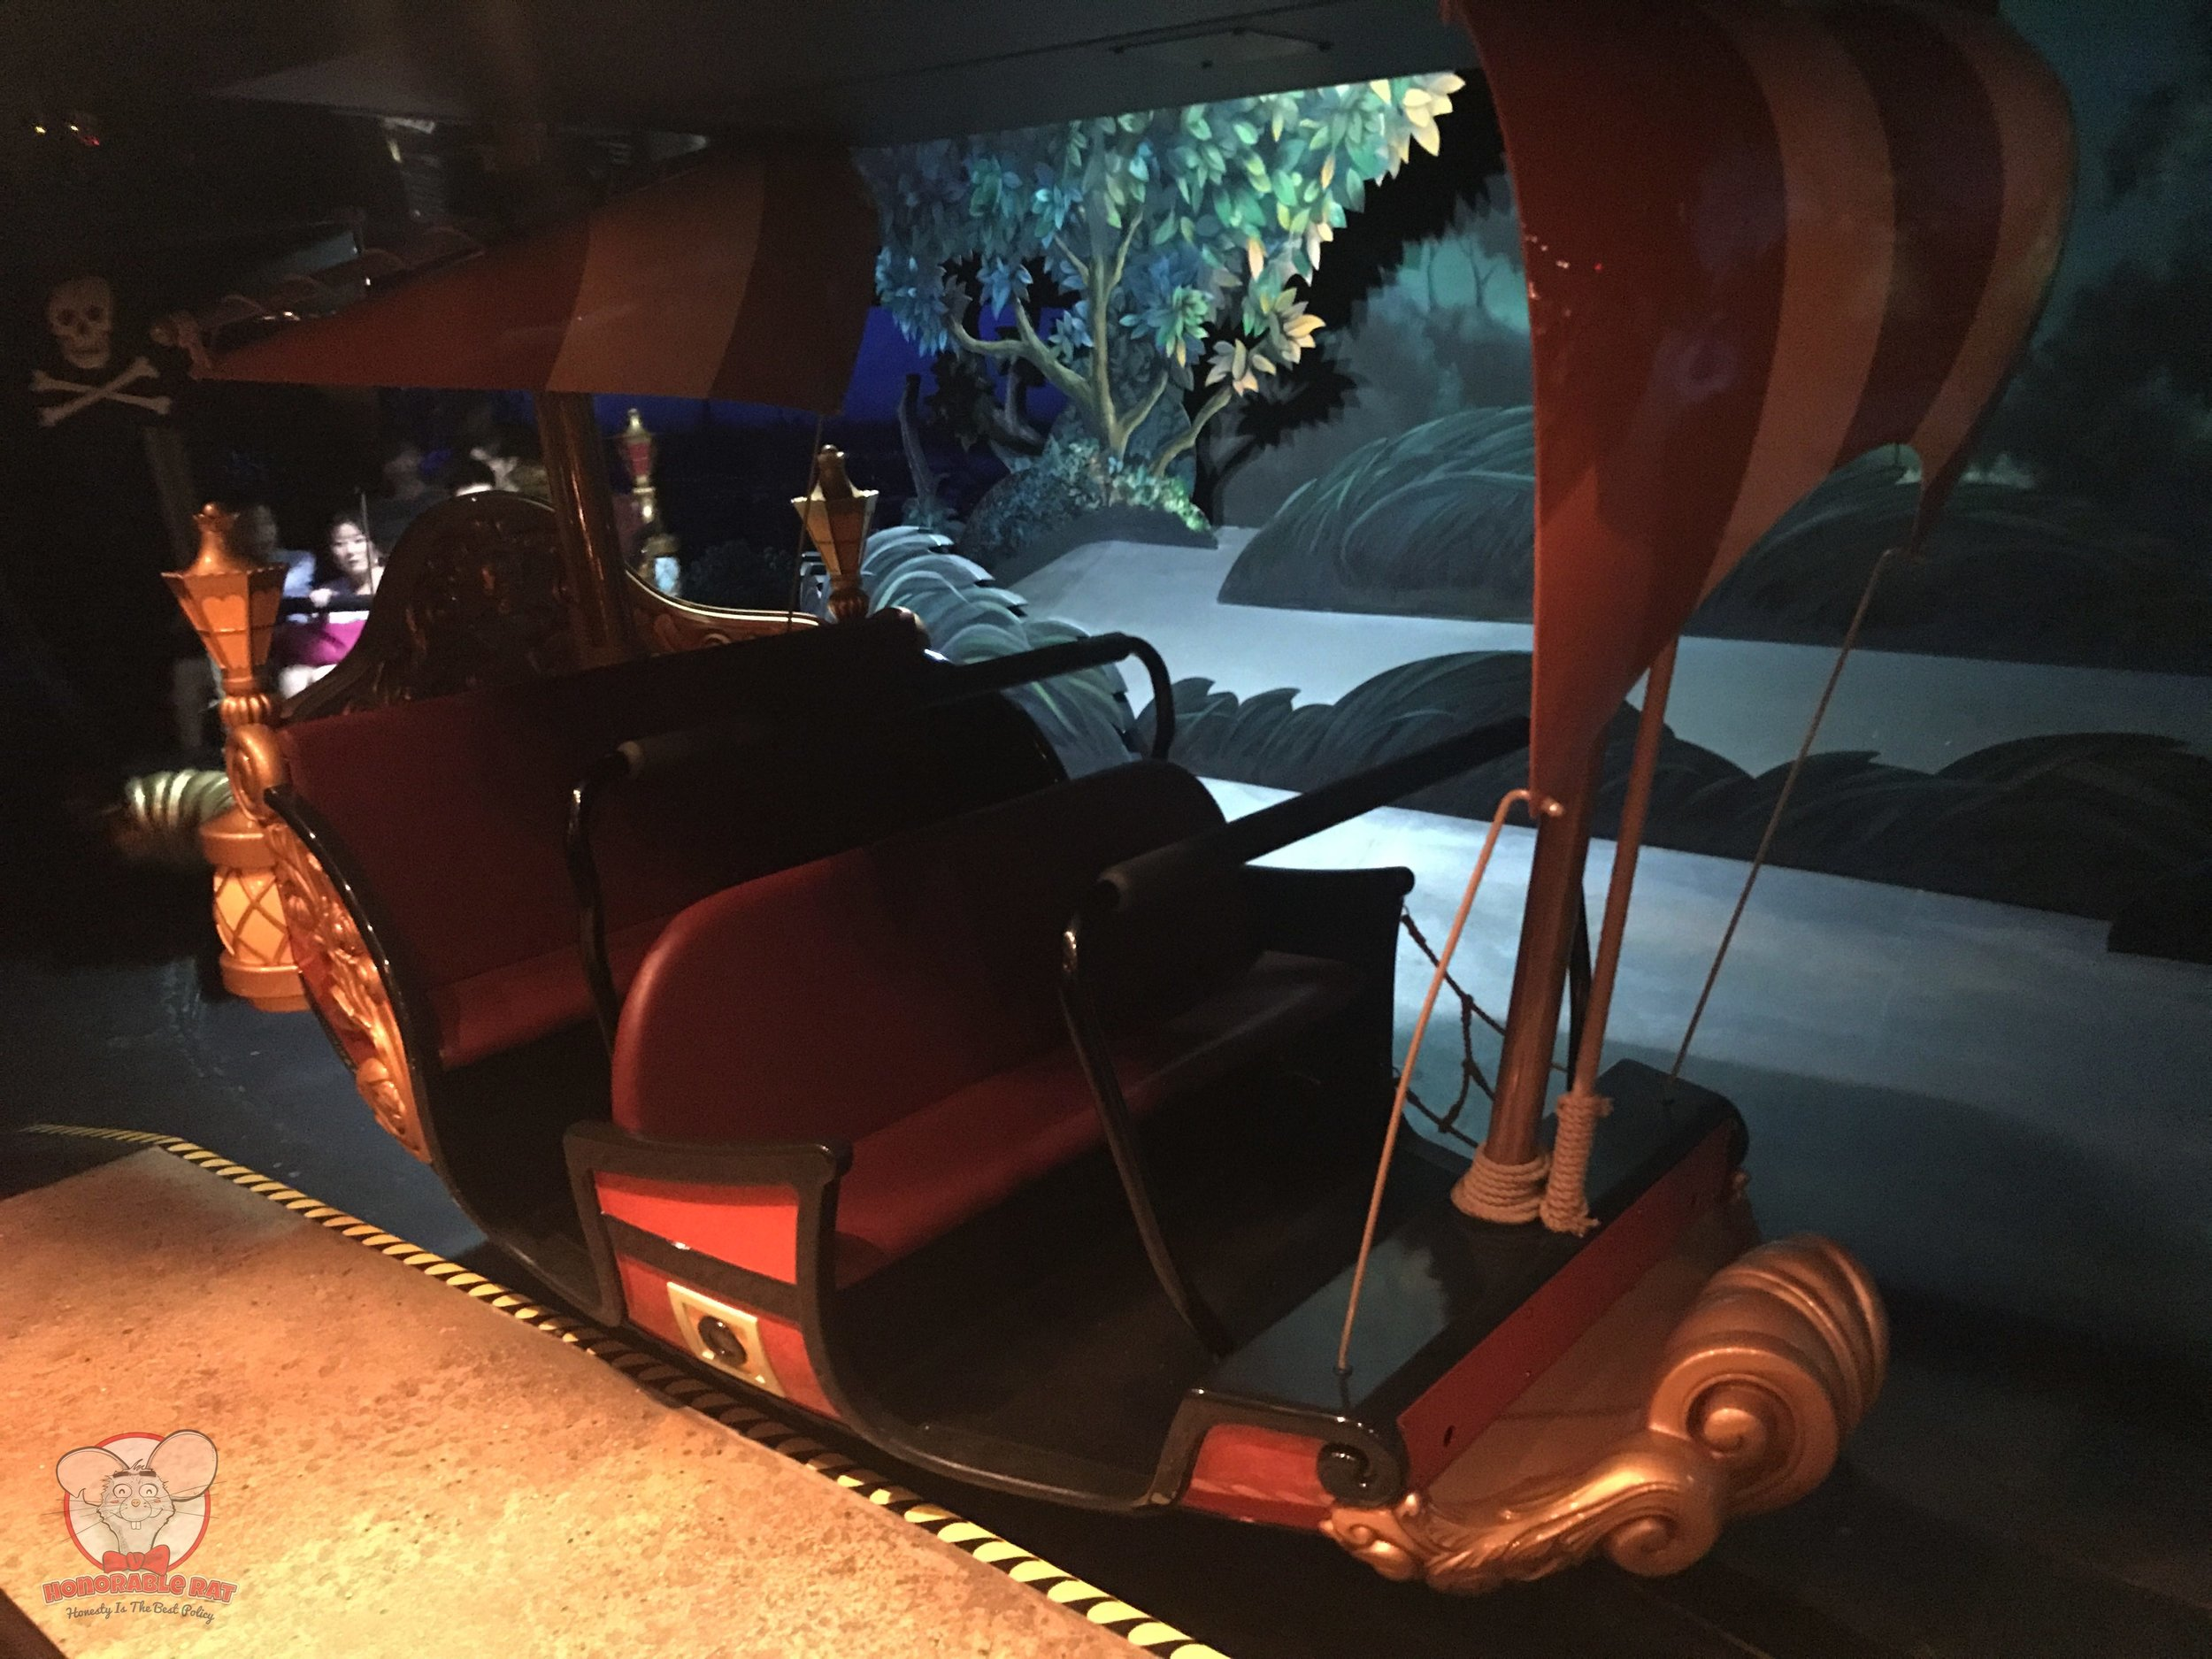 Peter Pan's Flight ride vehicle